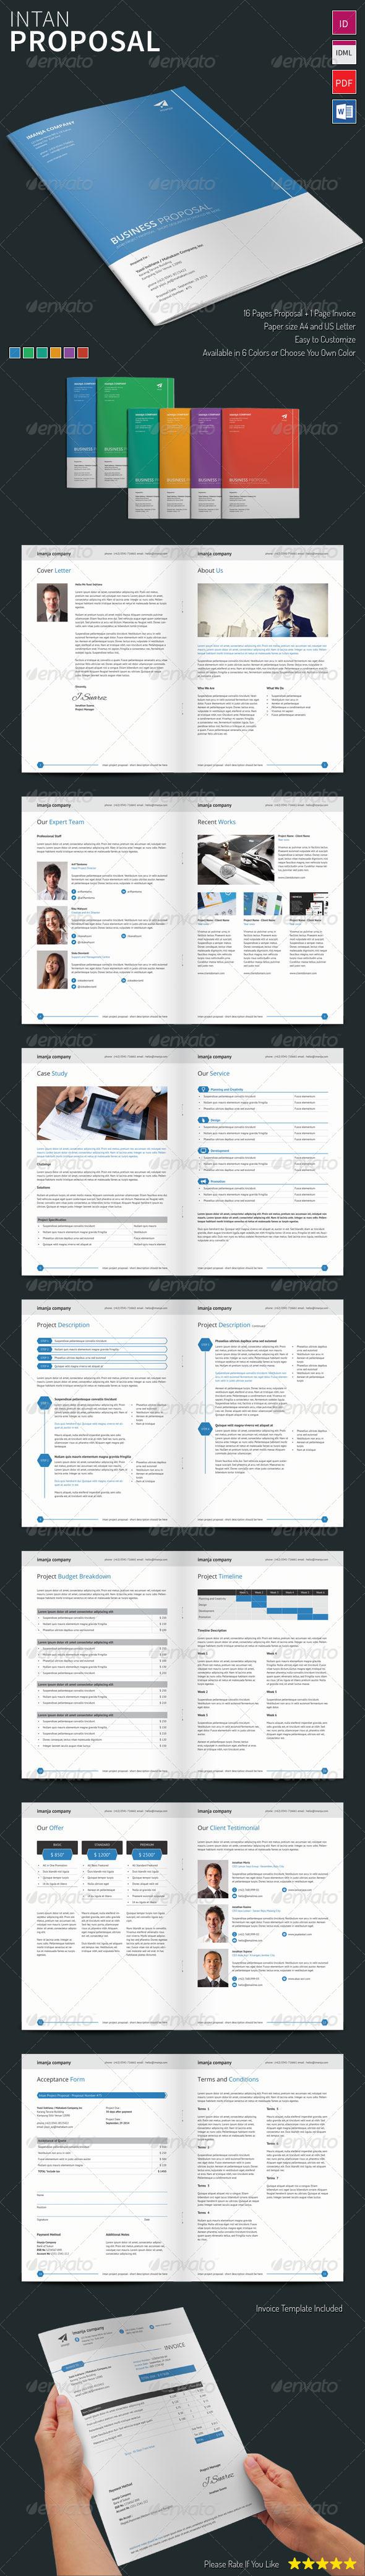 GraphicRiver Intan Proposal Template 8253783